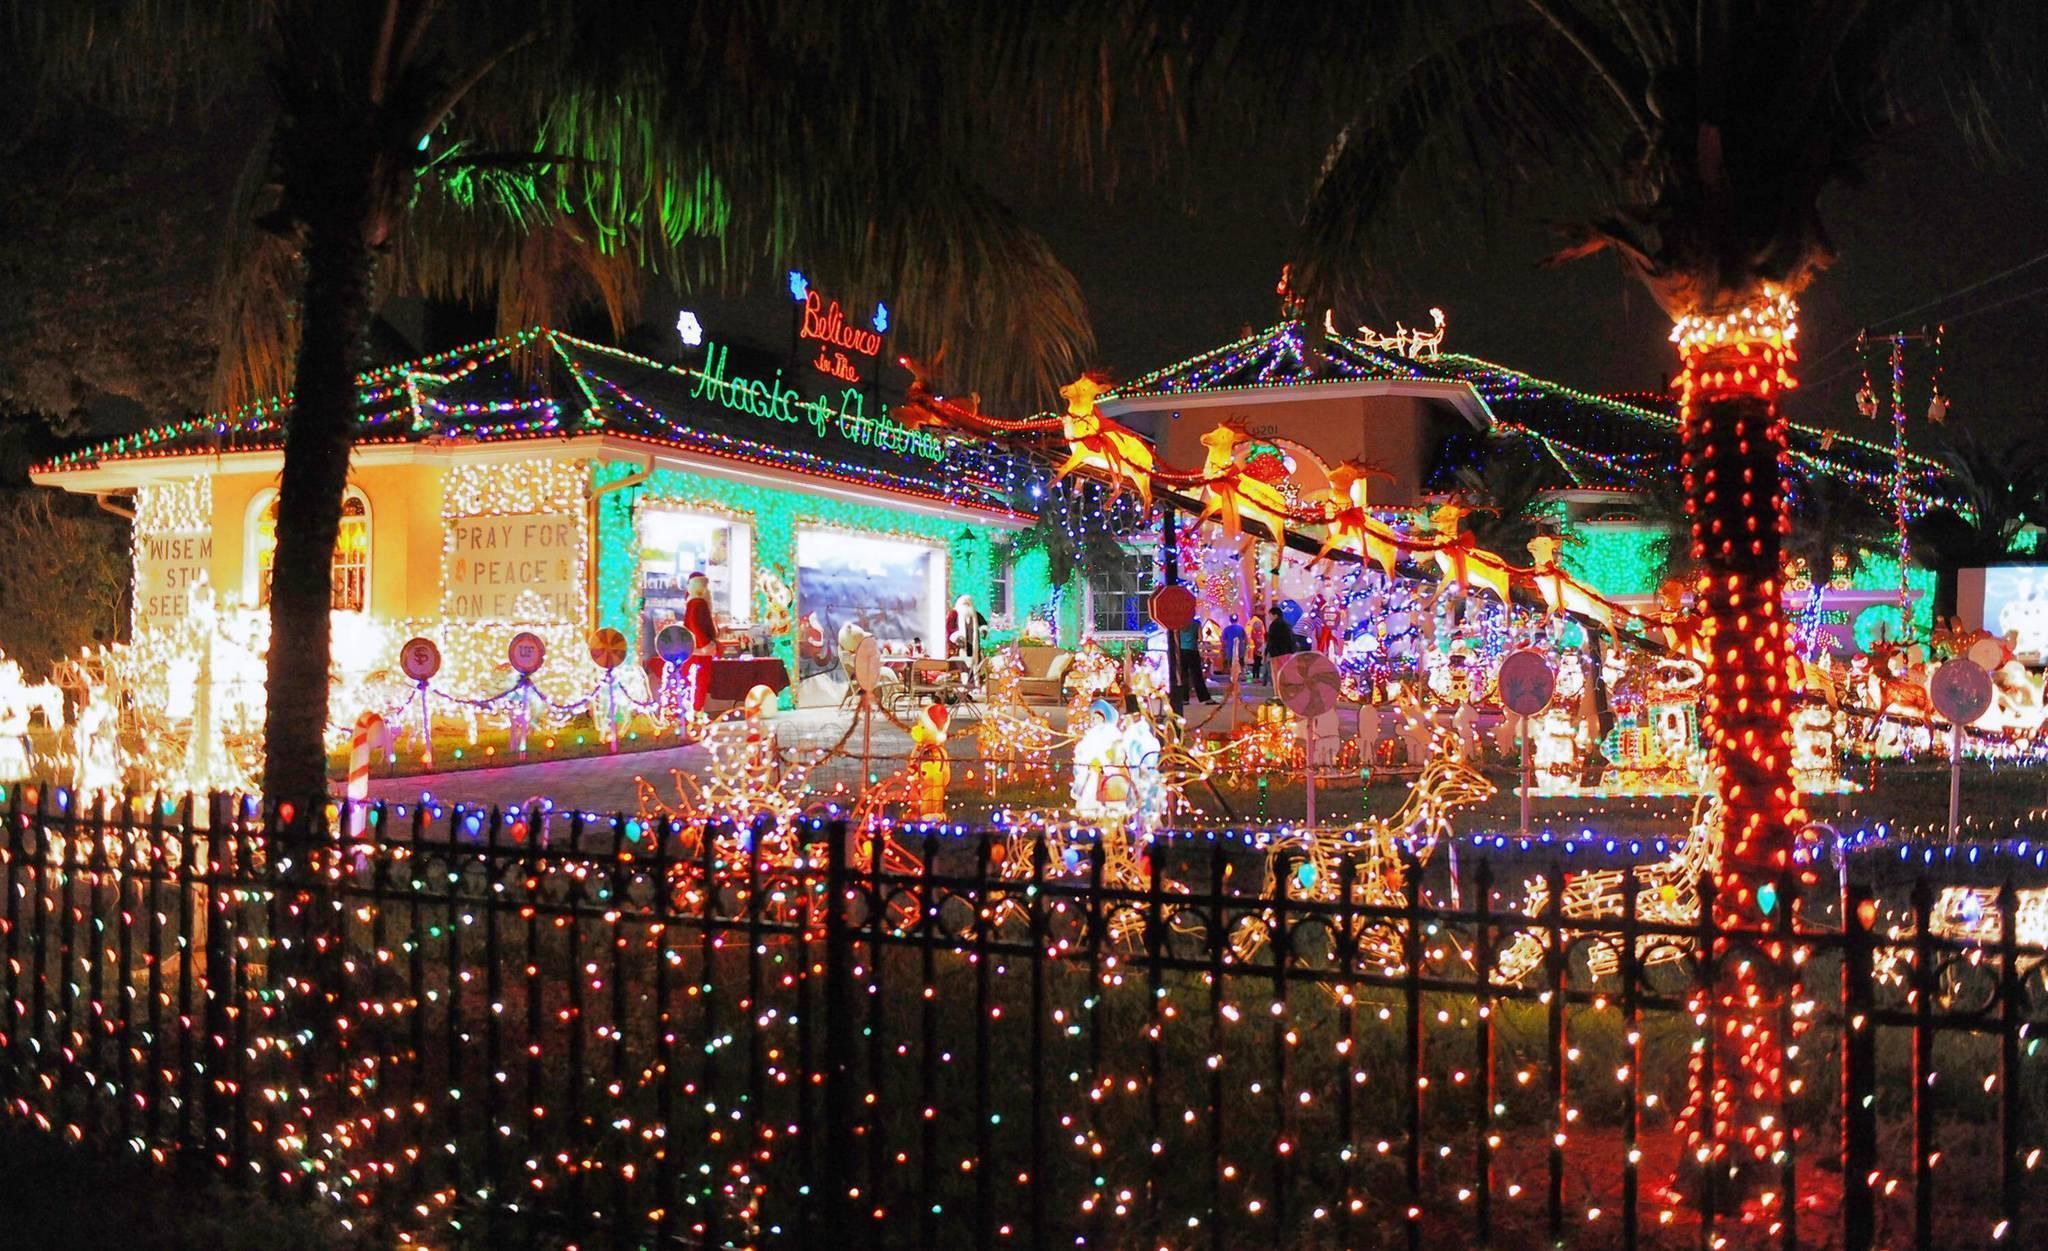 Huge Christmas Display At Plantation Home Is A Holiday